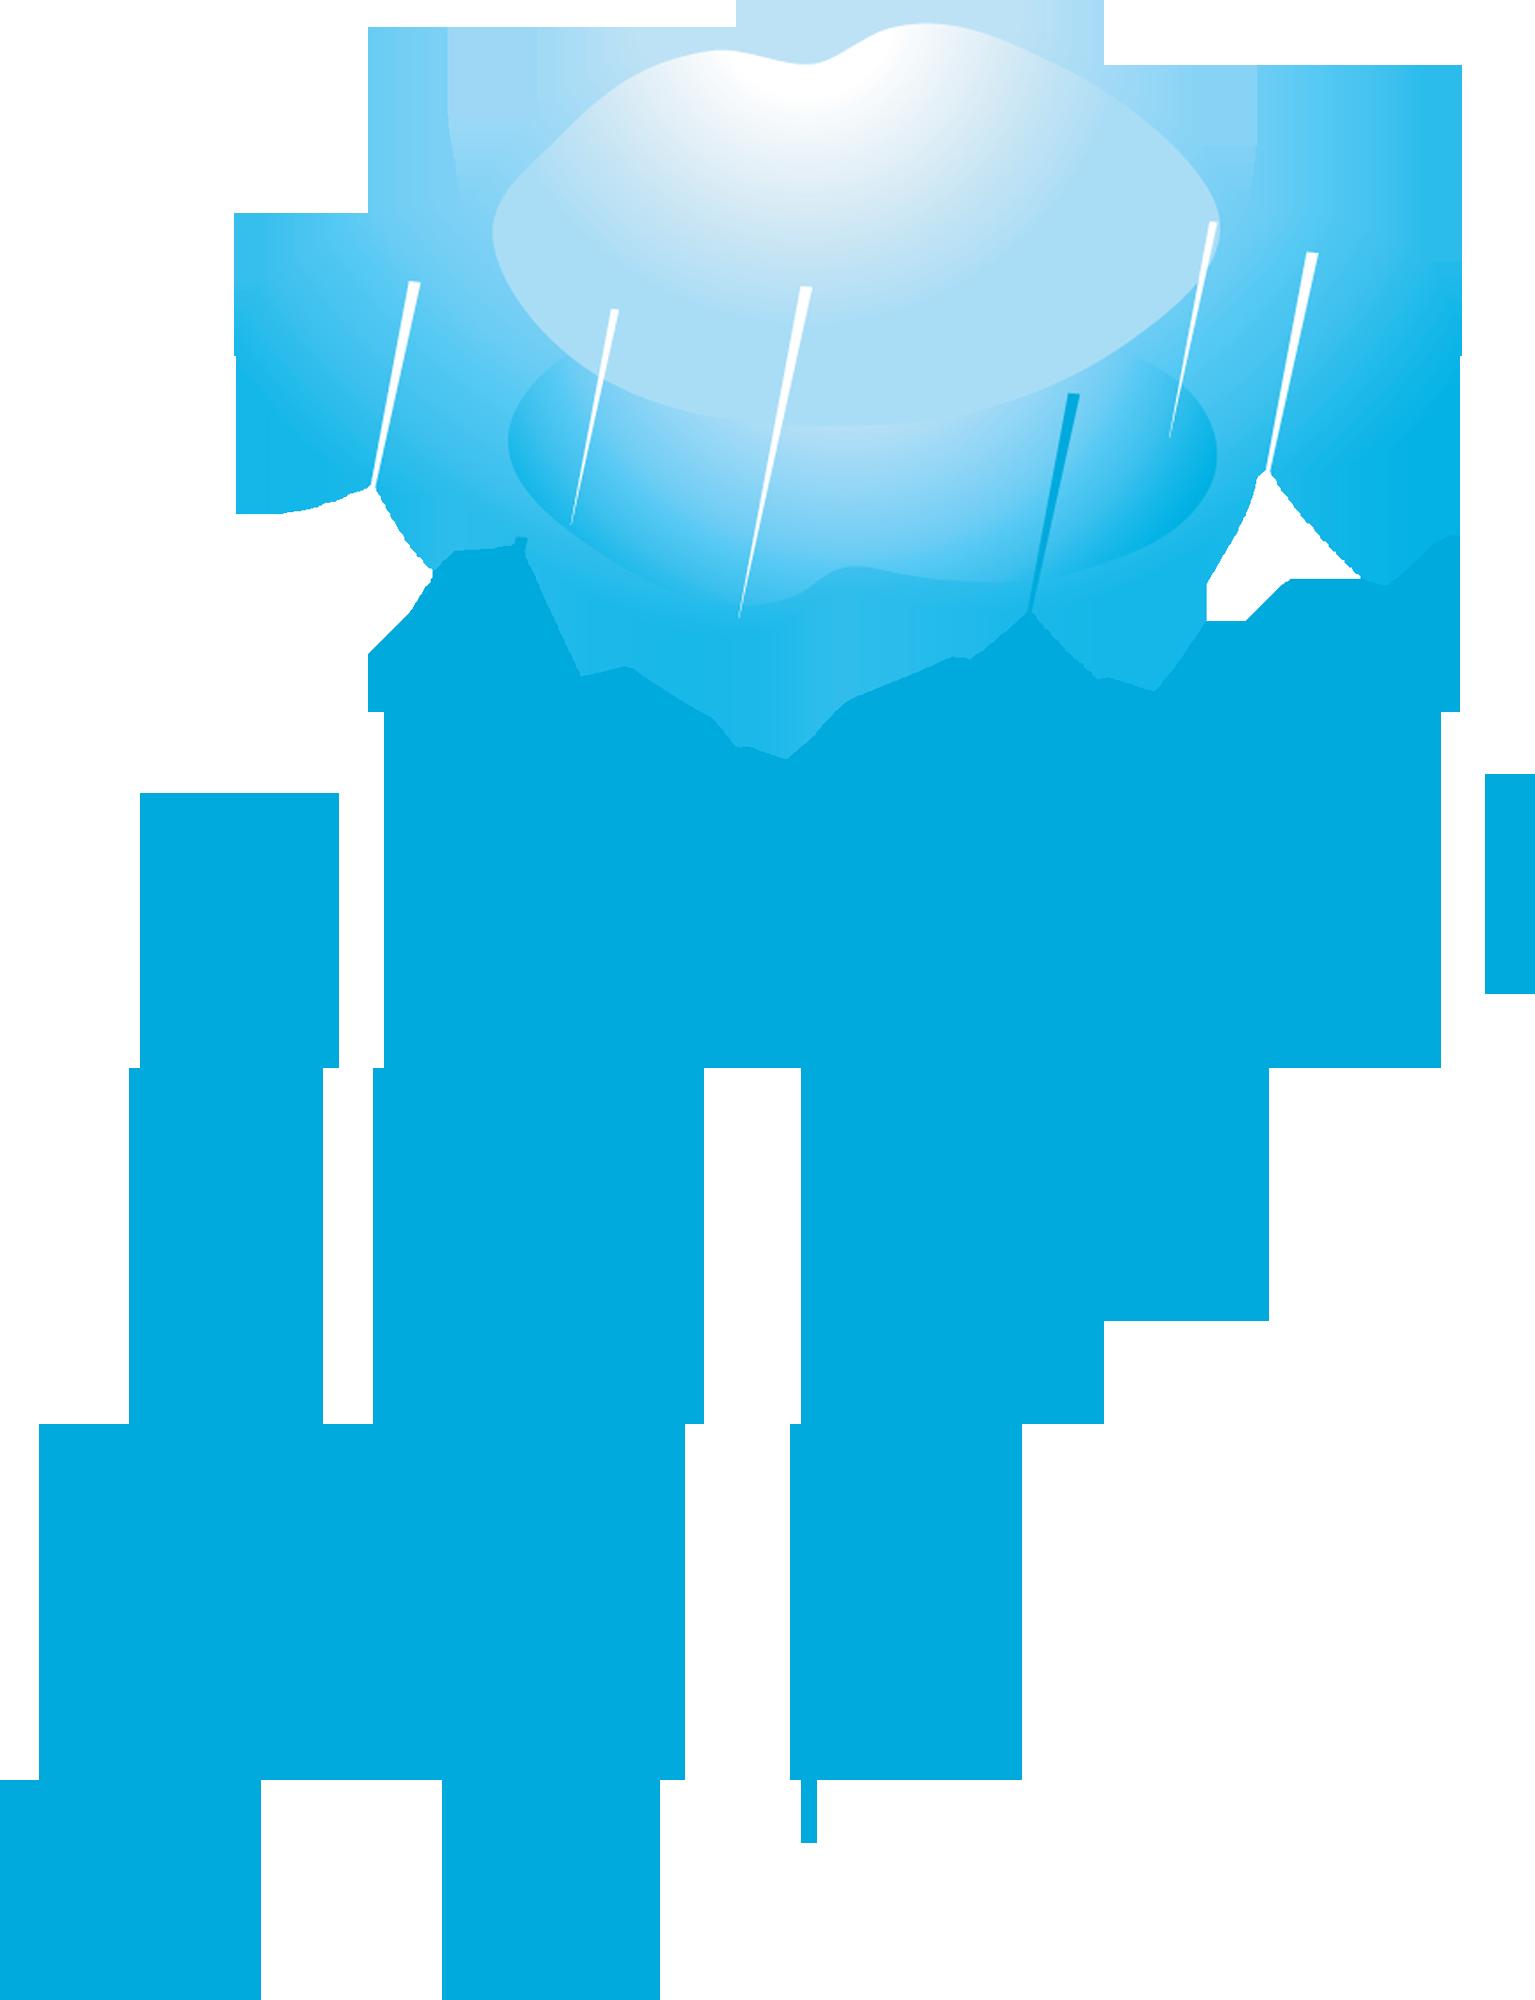 картинка дождик из тучки